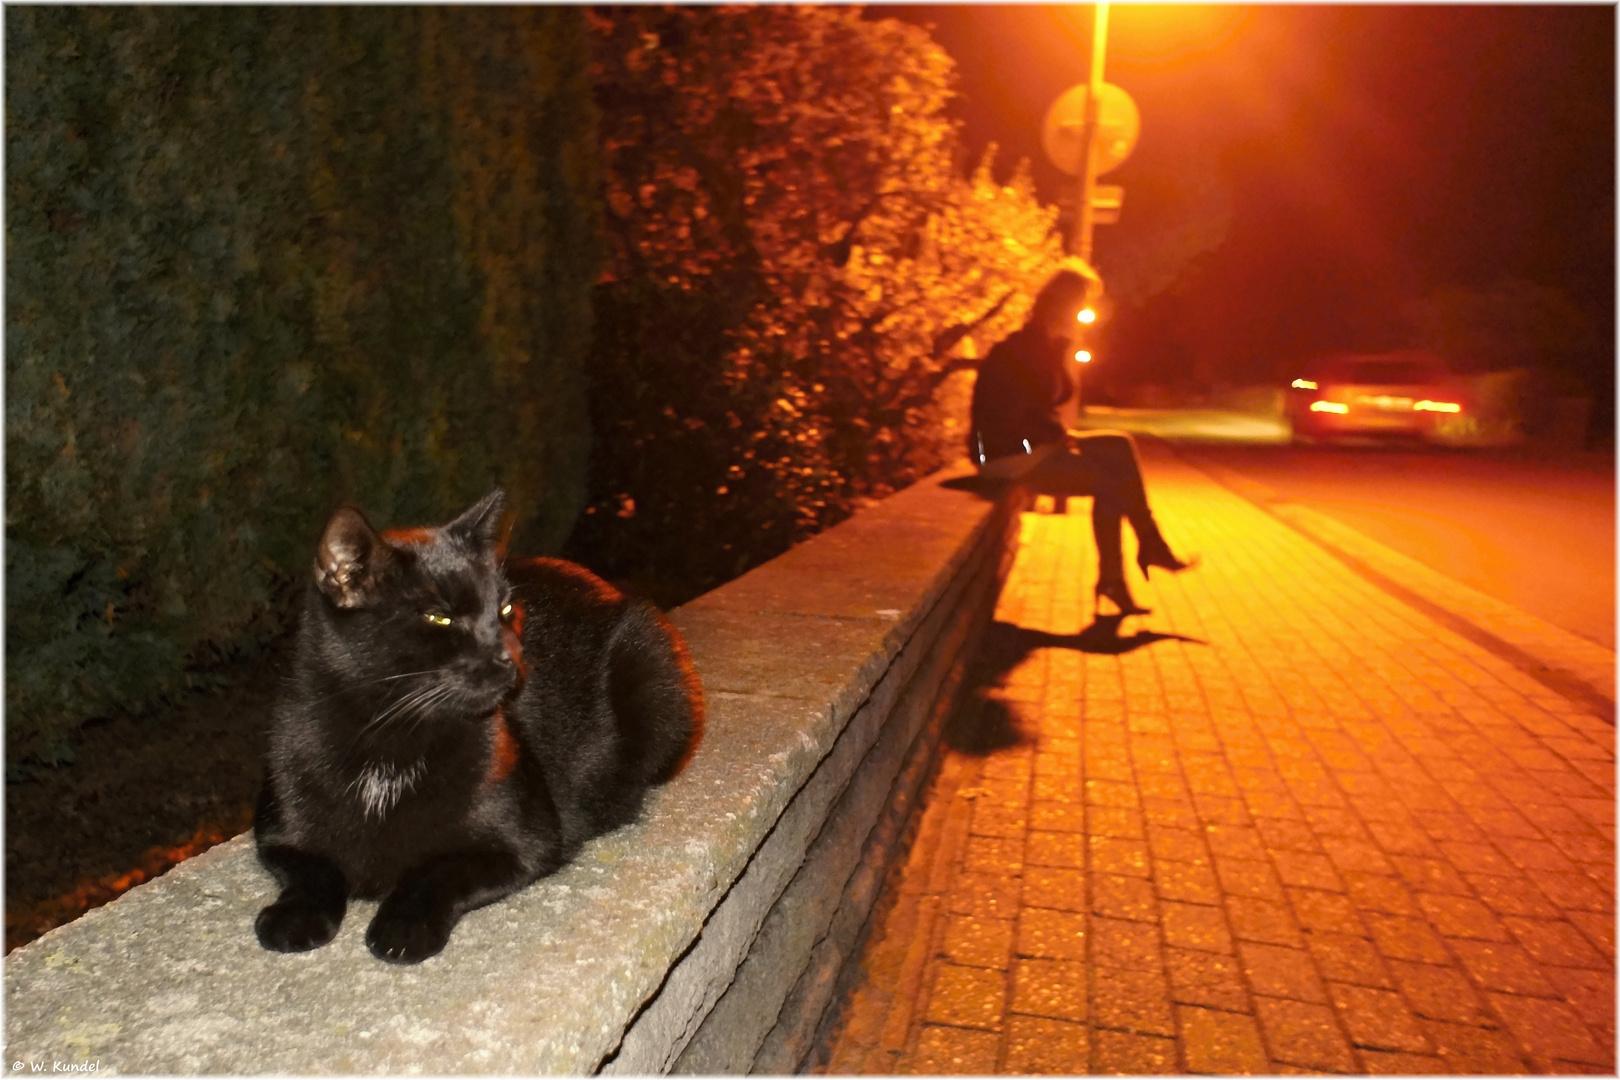 Catwalk - resting place